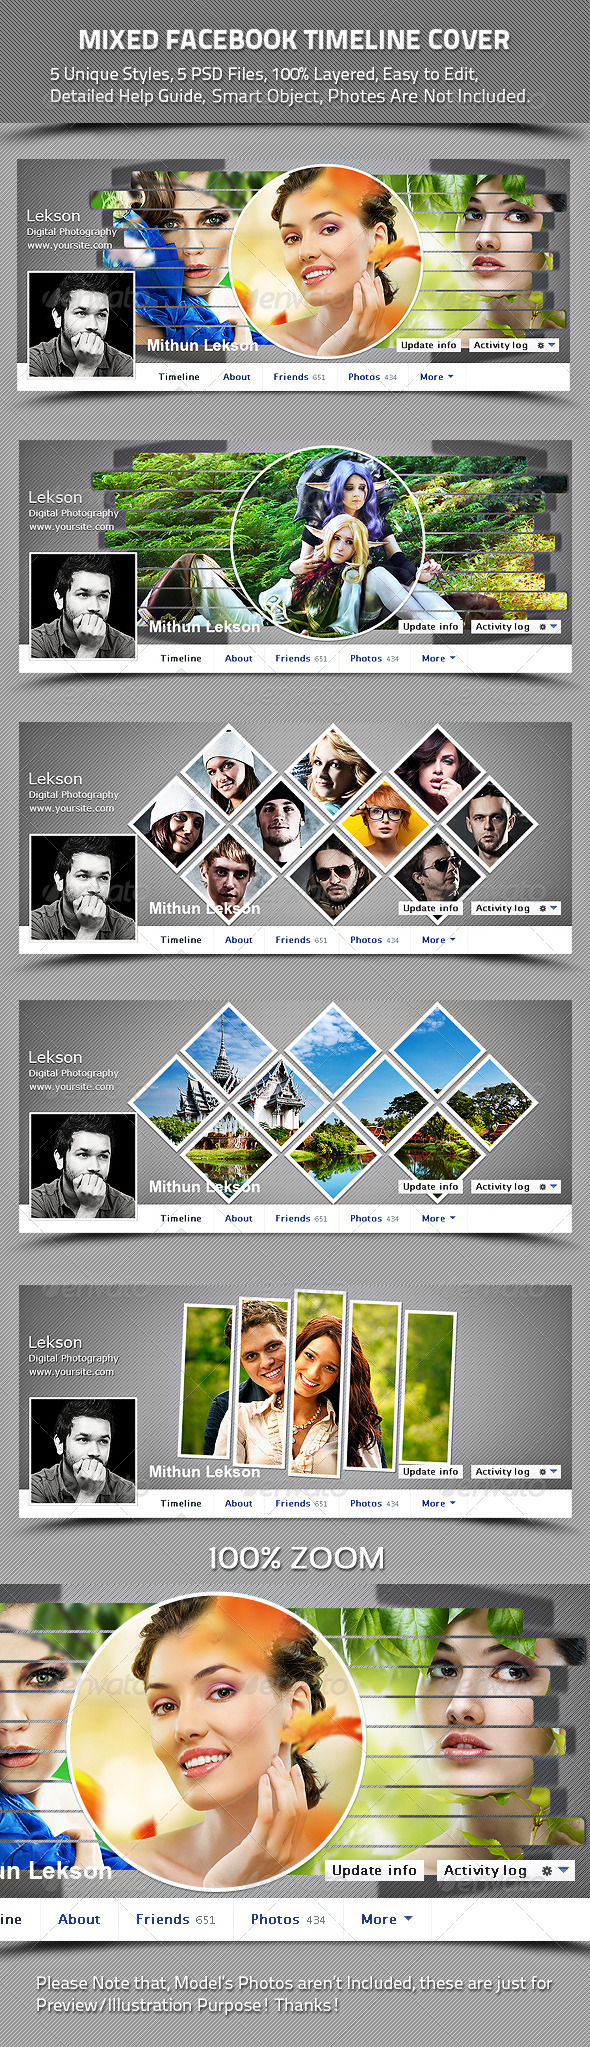 Mixed Facebook Timeline Cover - Facebook Timeline Covers Social Media